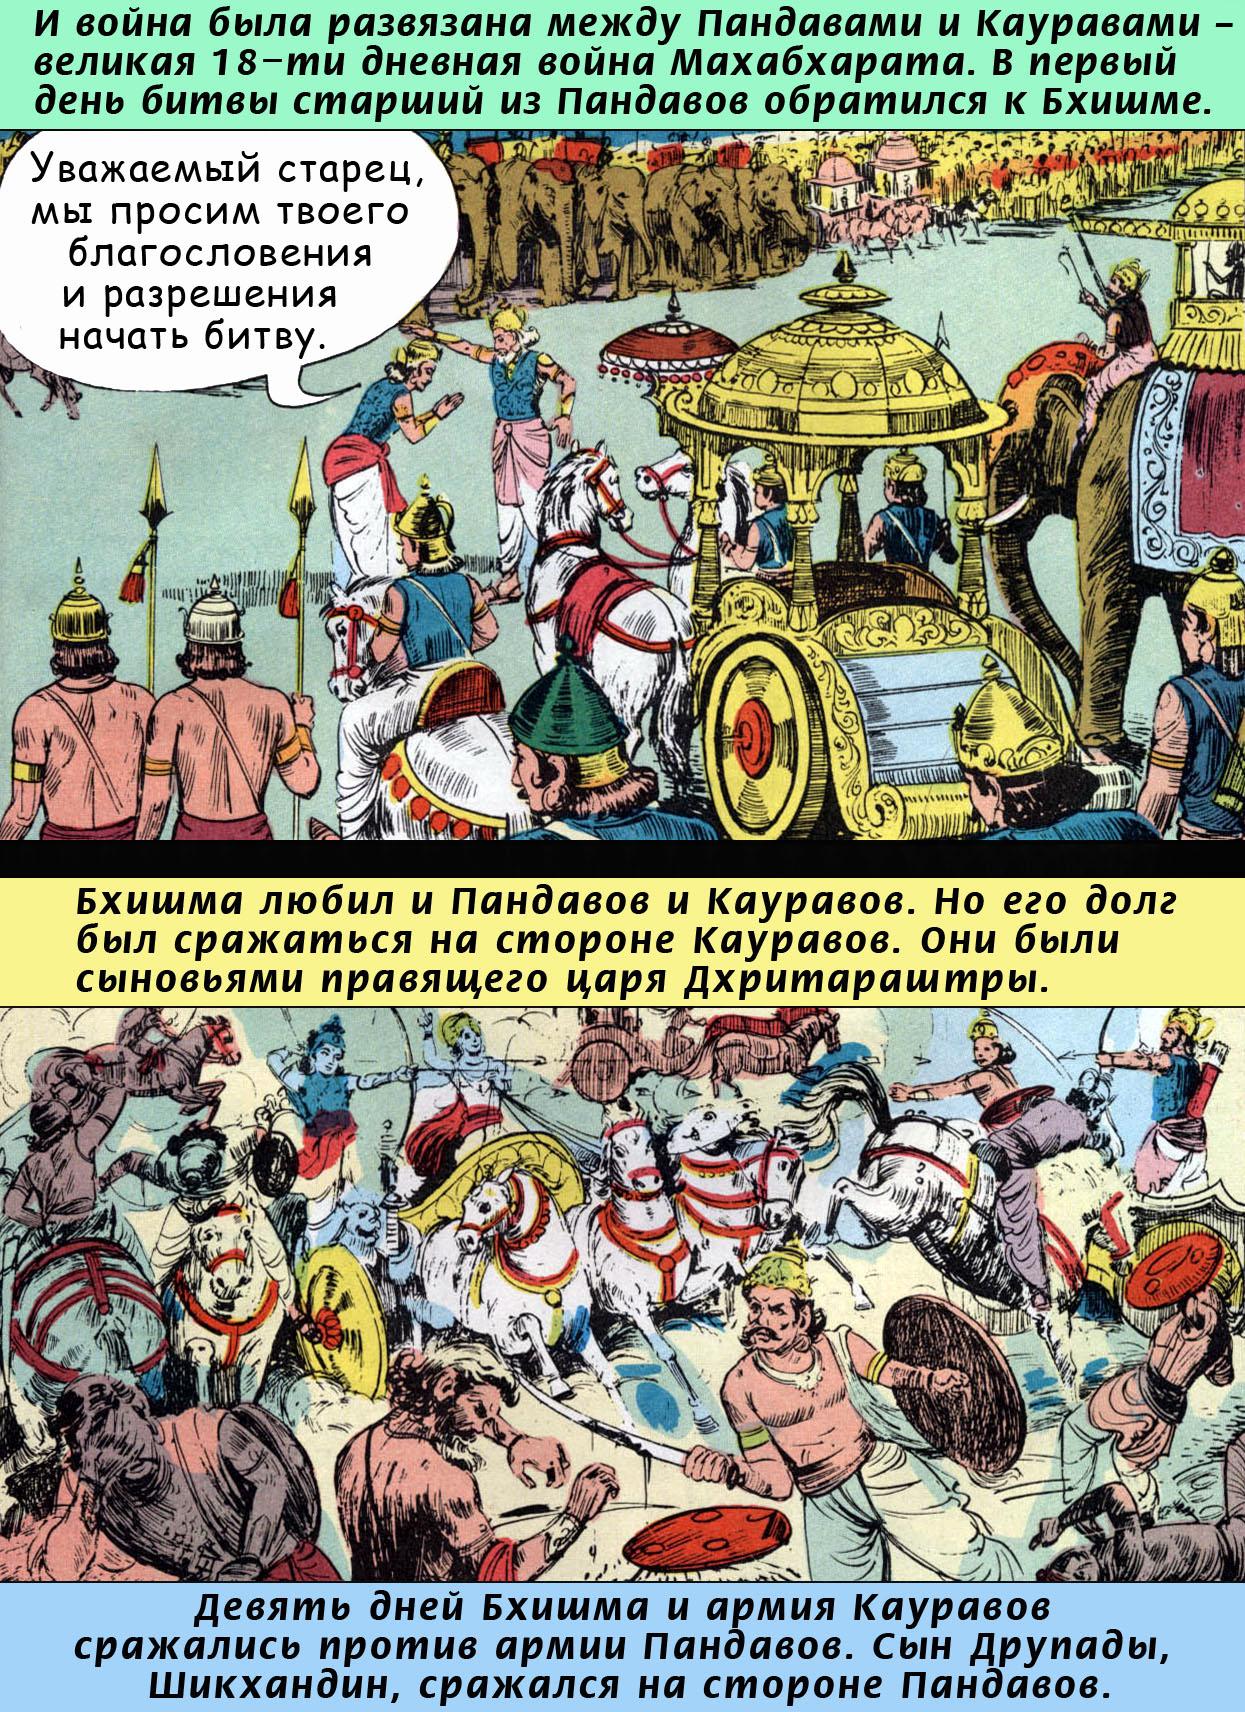 Бхишма 29 - ведический комикс